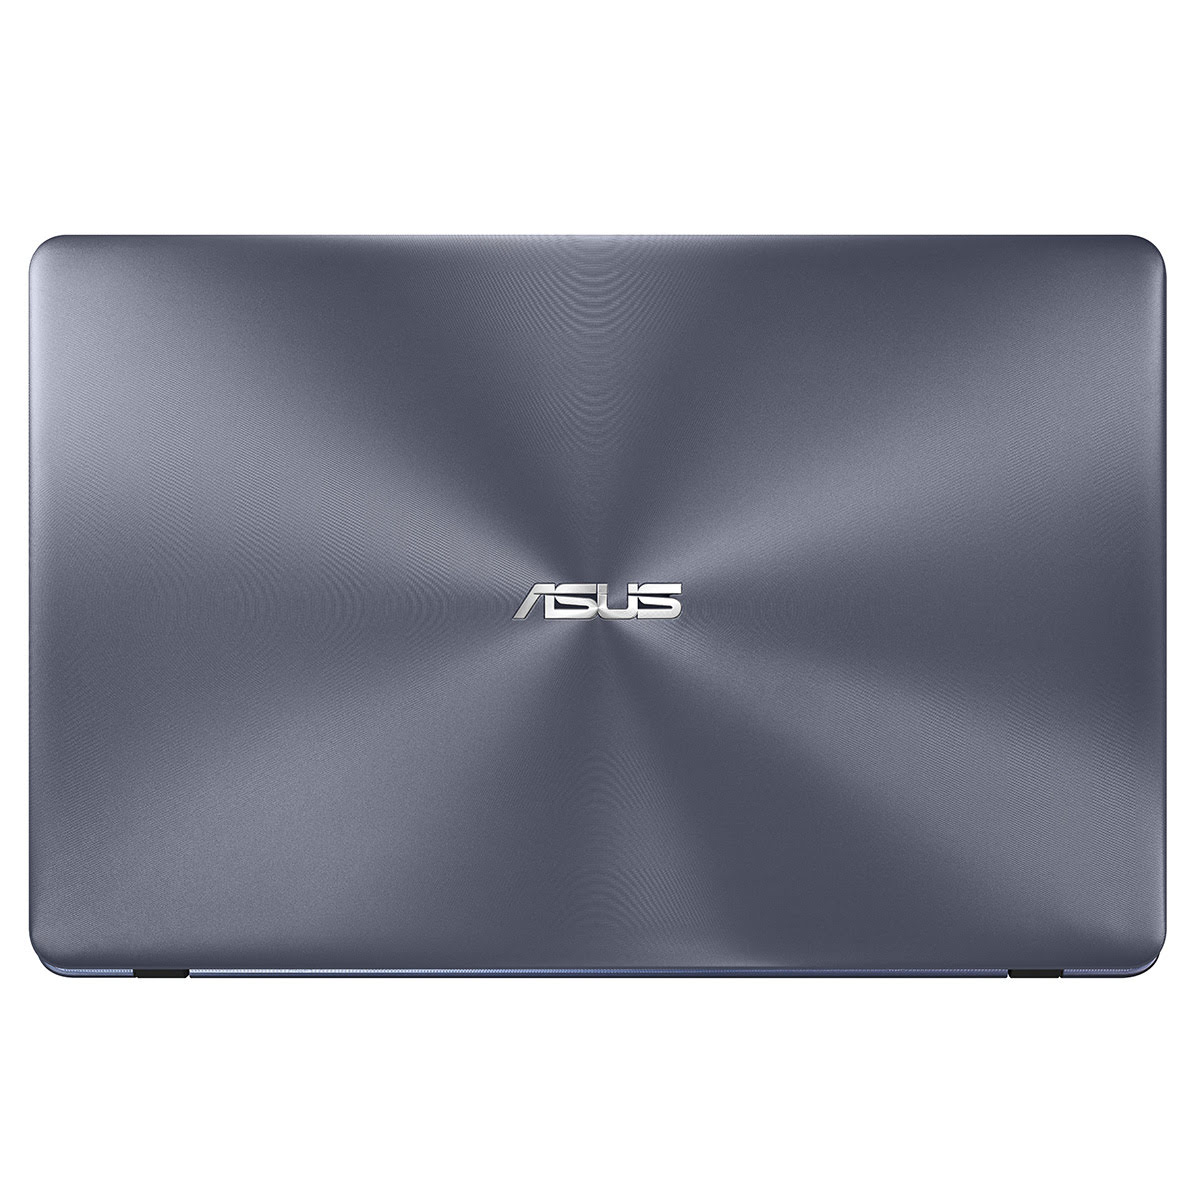 Vivobook 17 X705UA-BX402T (90NB0EV1-M04870) - Achat / Vente PC portable sur Picata.fr - 2